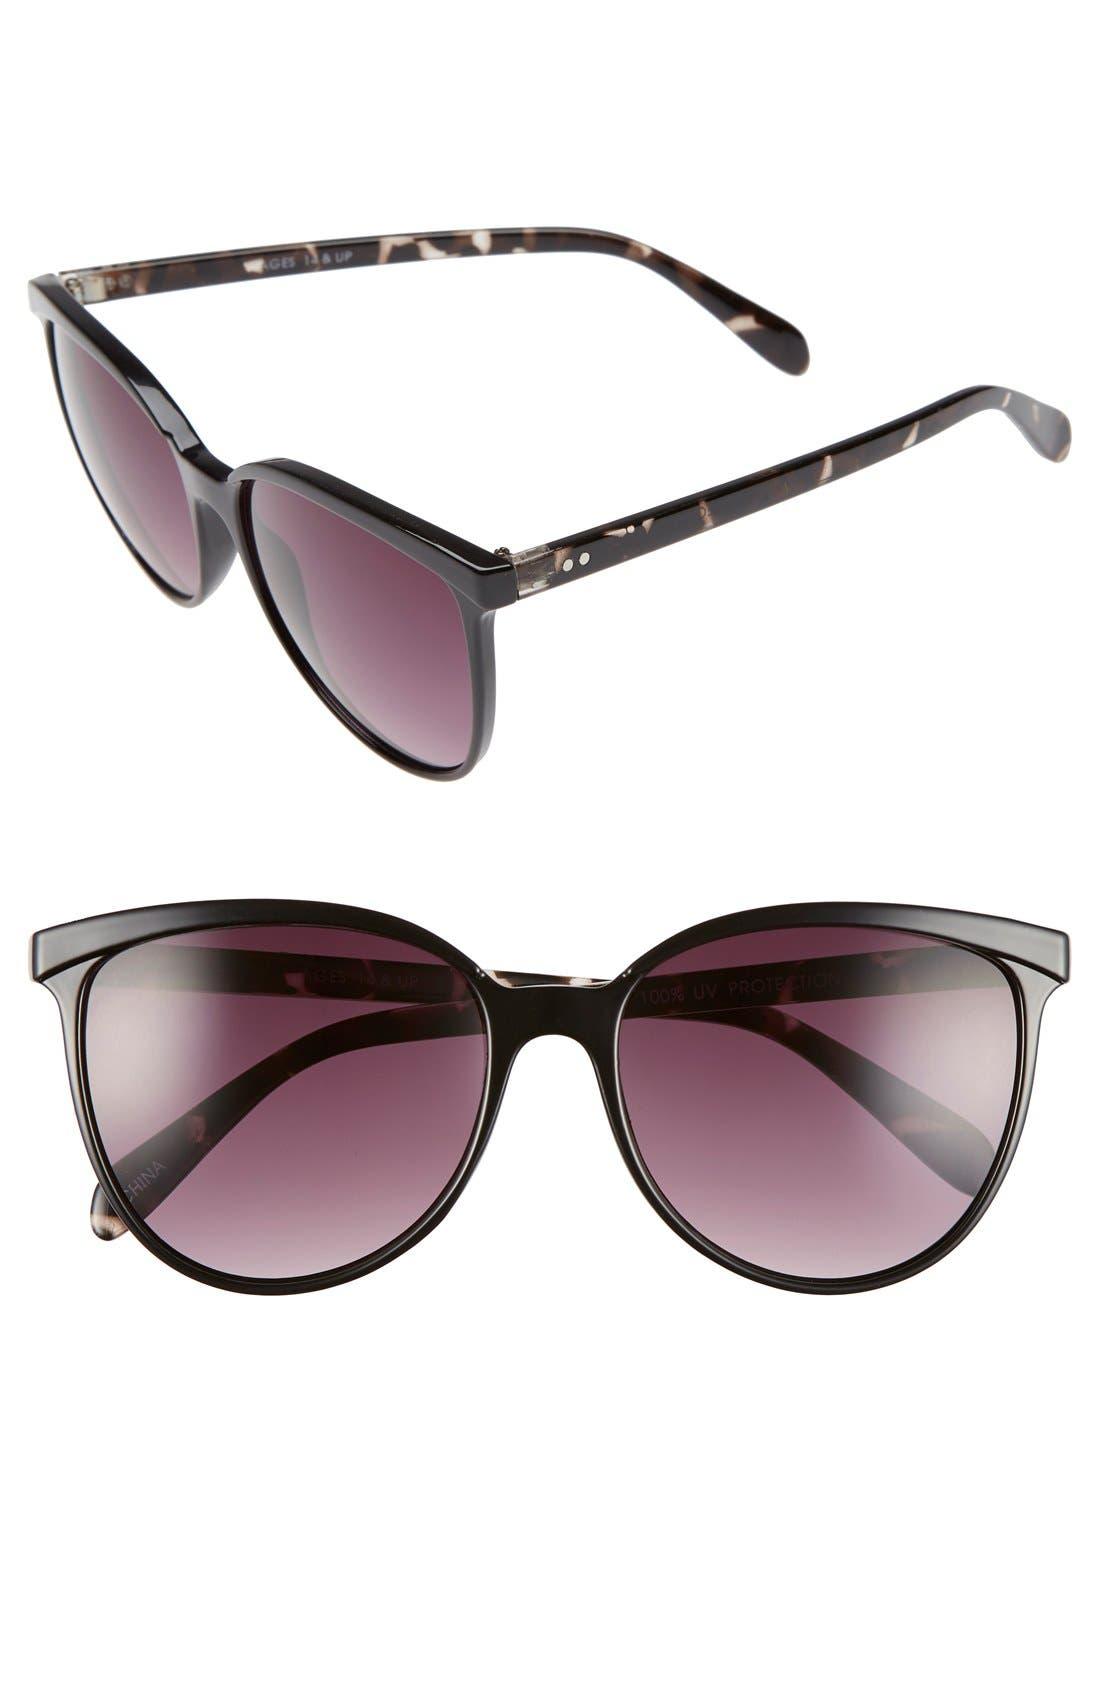 Main Image - BP. 56mm Two-Tone Cat Eye Sunglasses